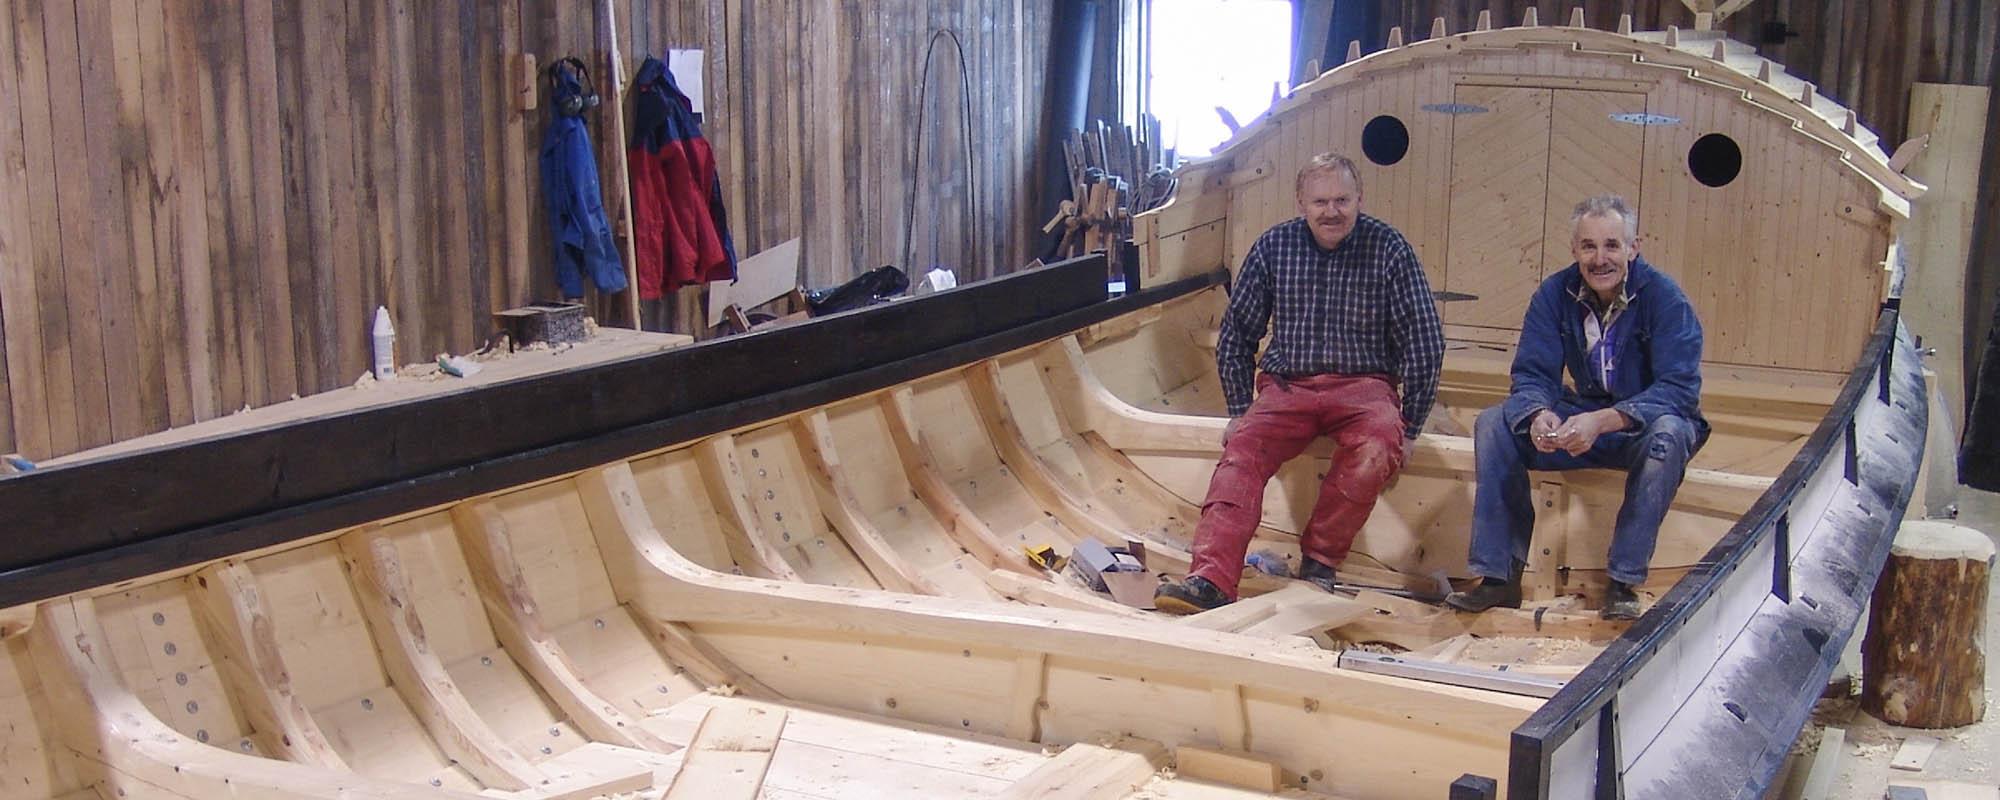 Prosjekt Åfjordsbåt